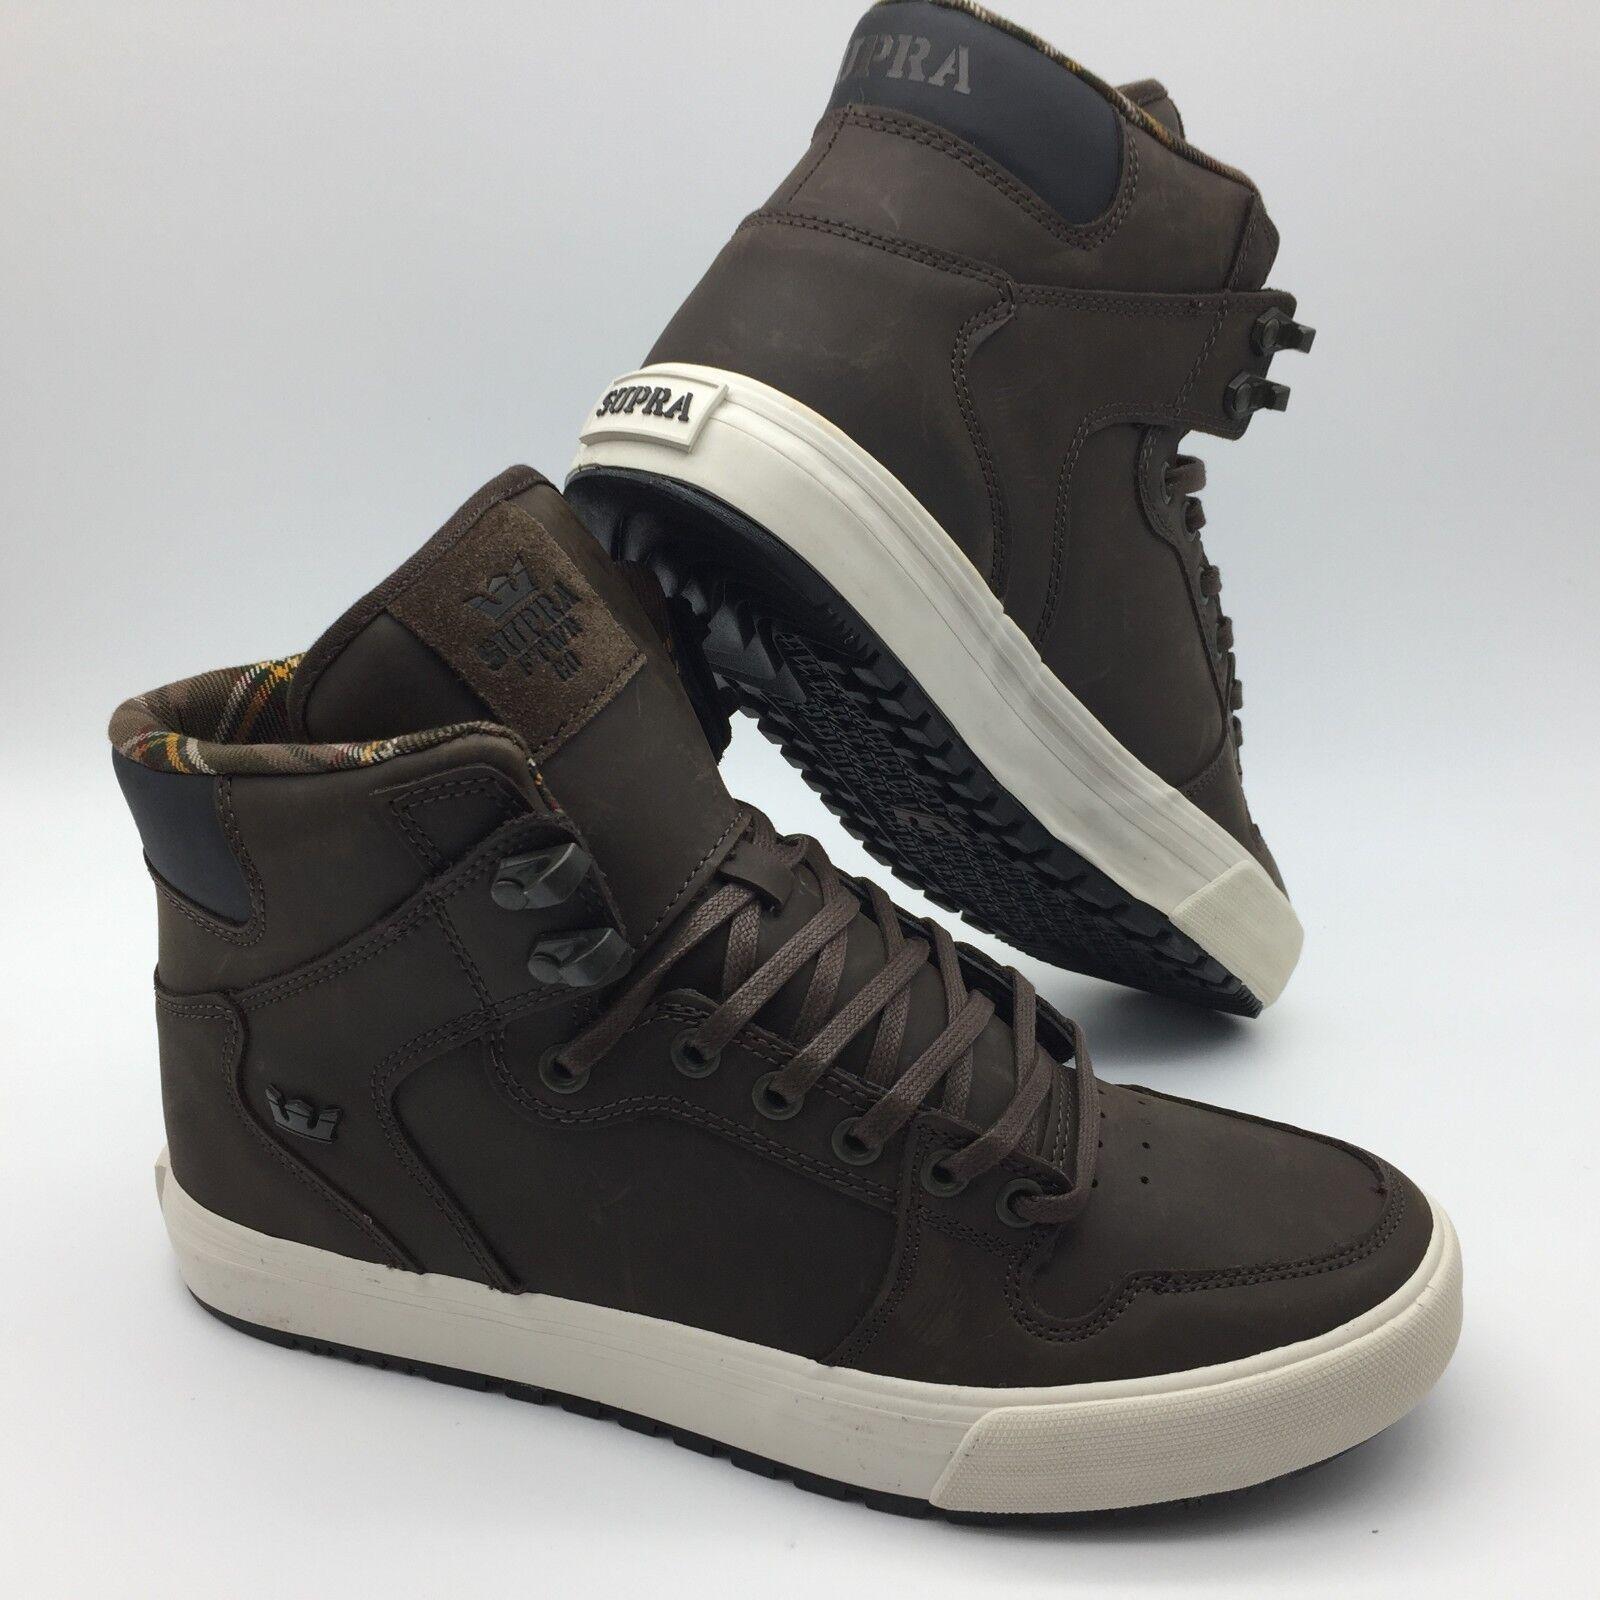 Supra Men's shoes  Vaider CW  Demitasse-Bone